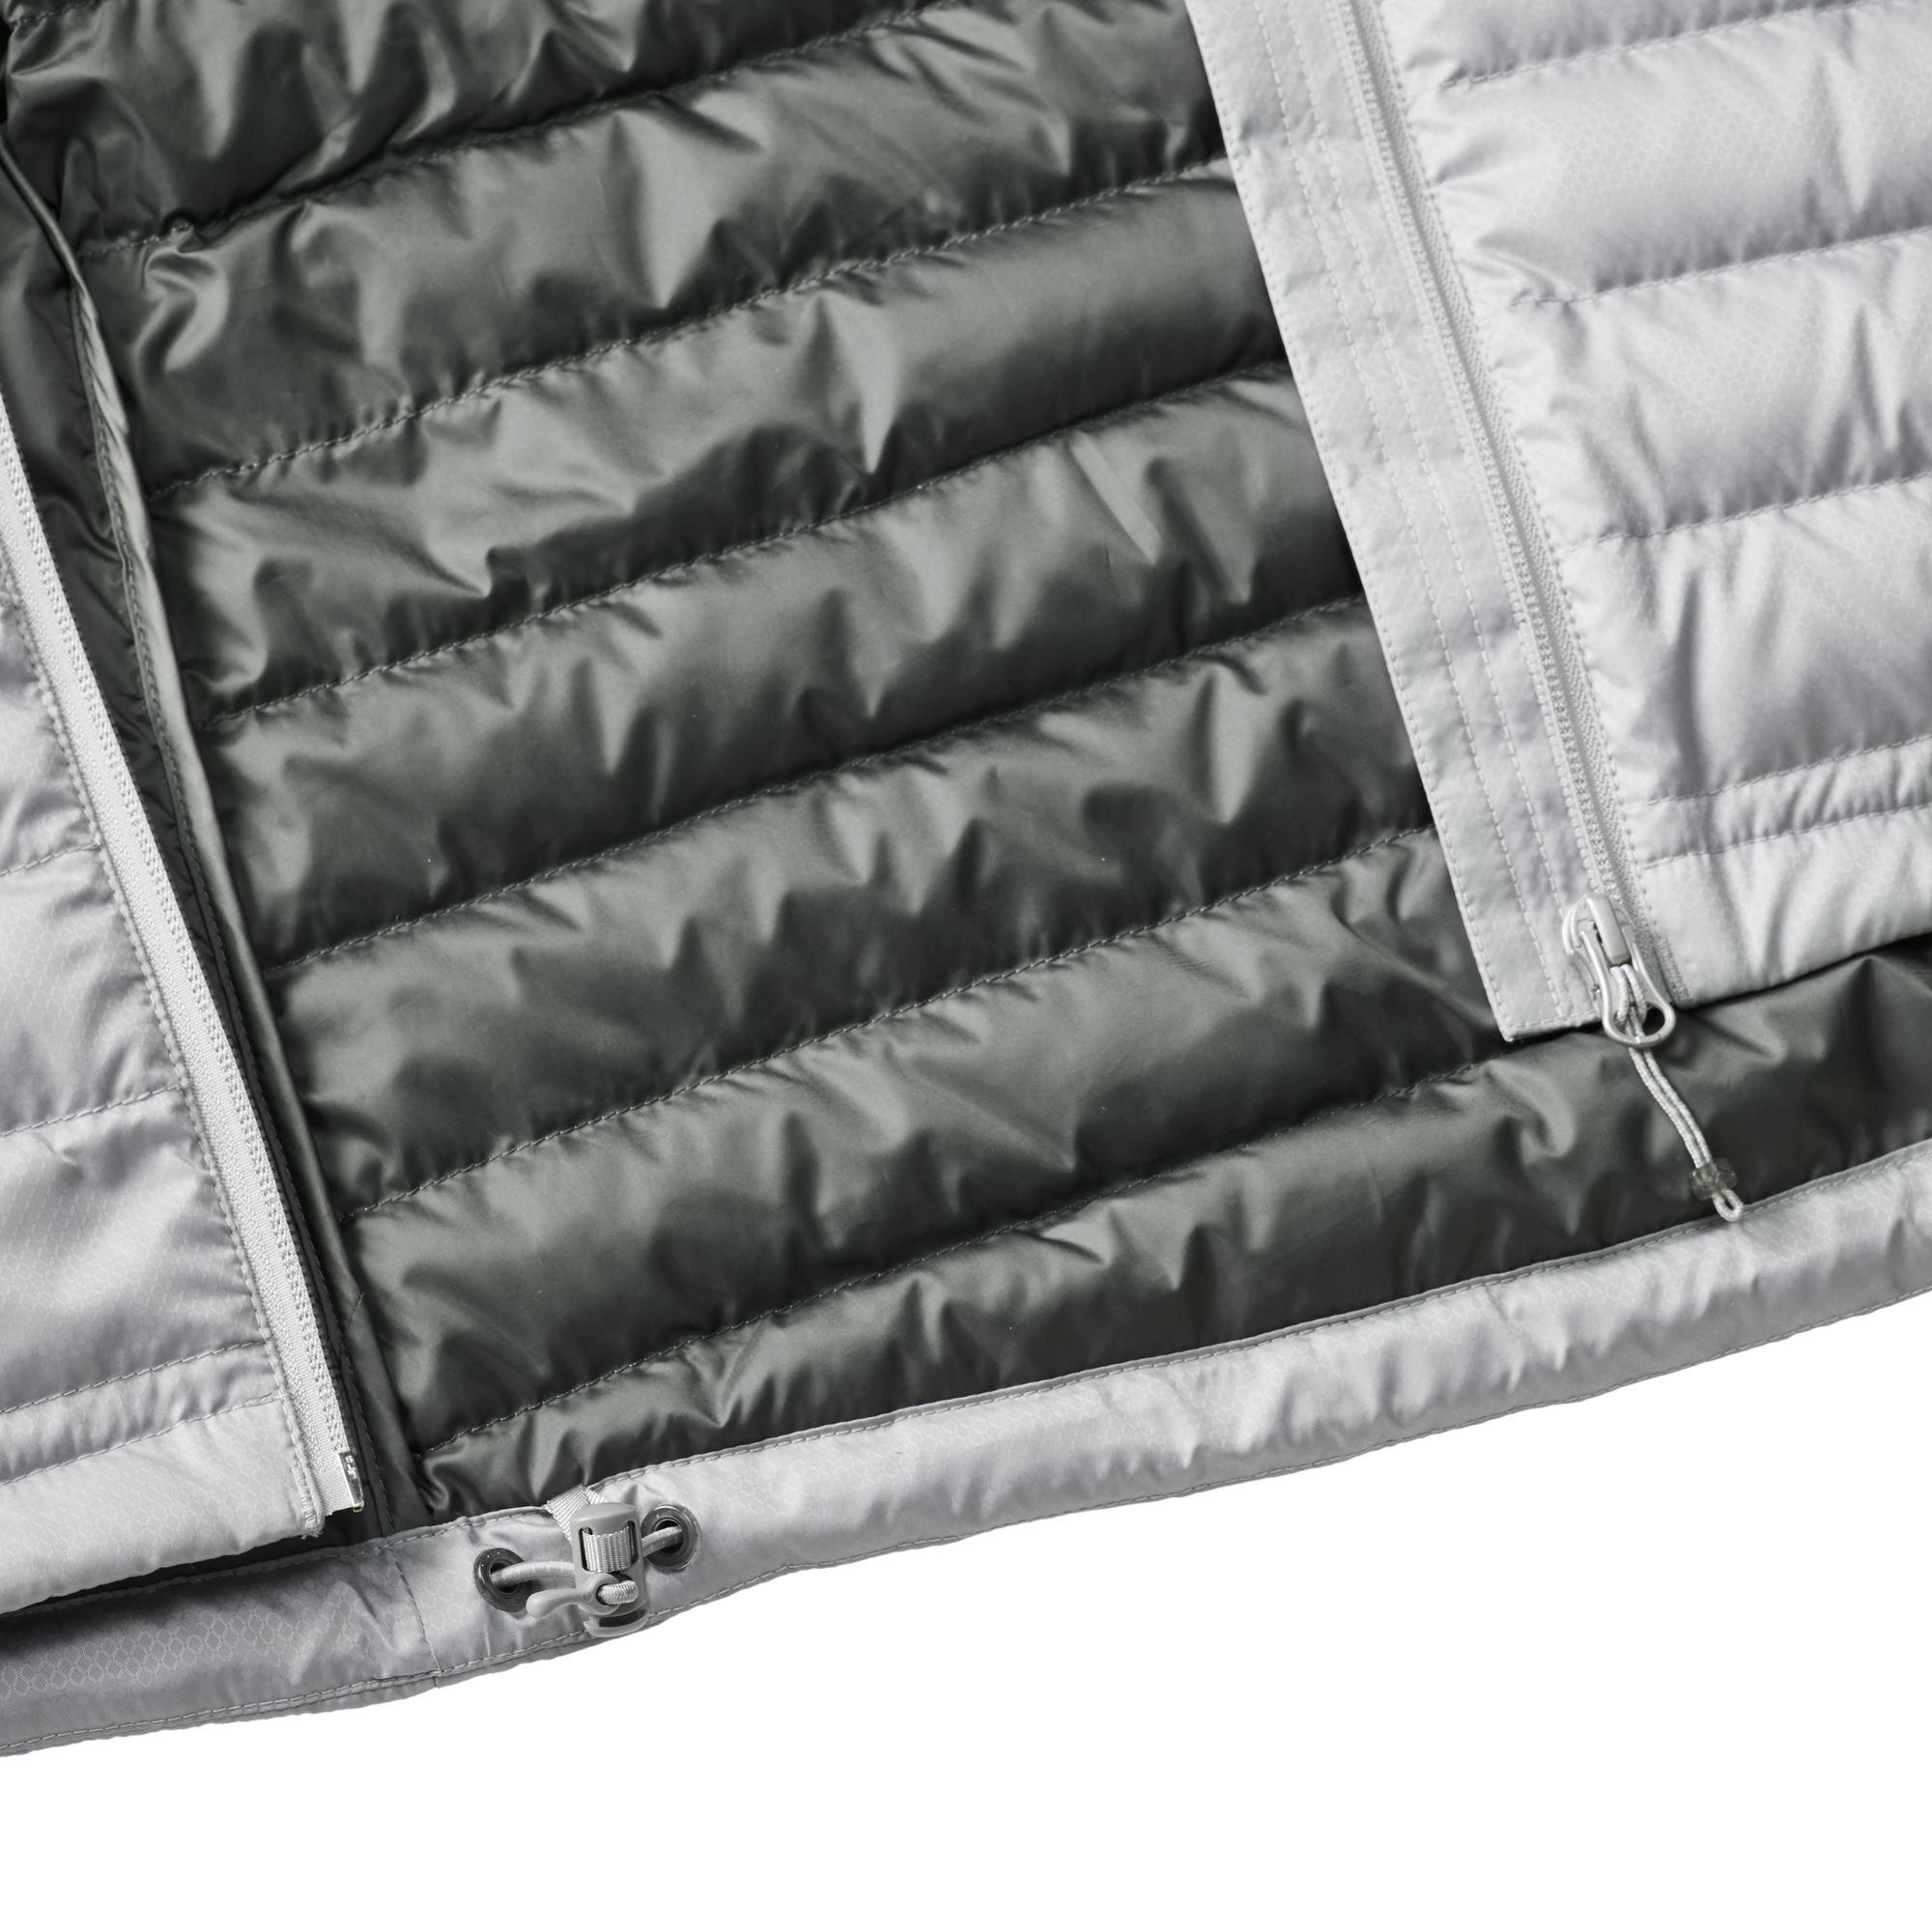 NEW-Kathmandu-Heli-Men-039-s-Lightweight-Duck-Down-Coat-Warm-Puffer-Jacket-v2 thumbnail 25